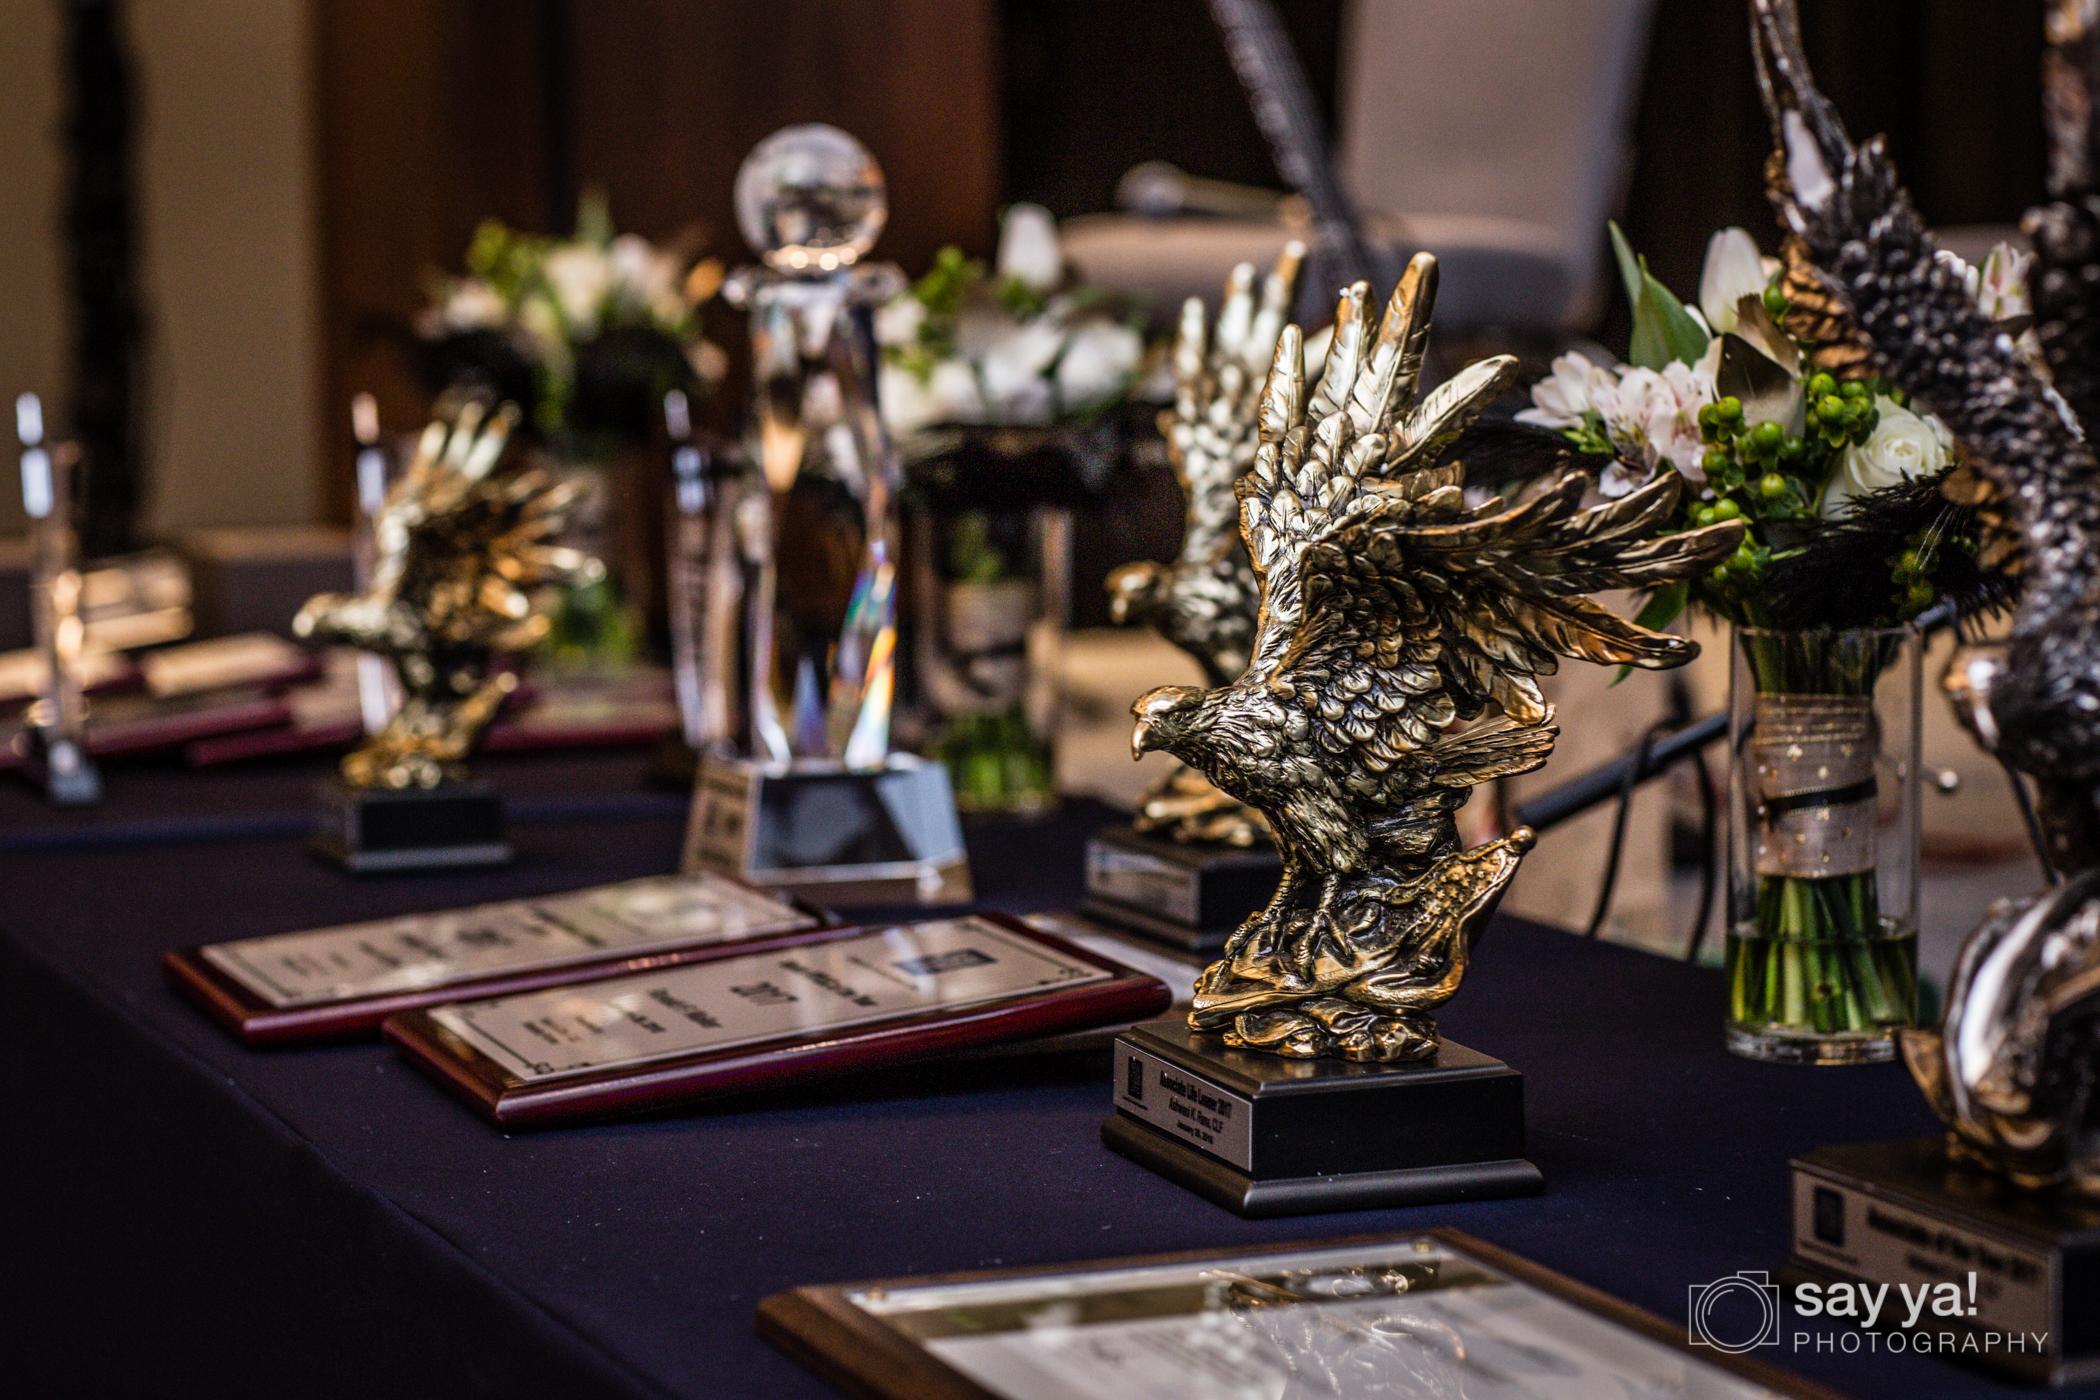 New York Life Kick Off Honor Banquet